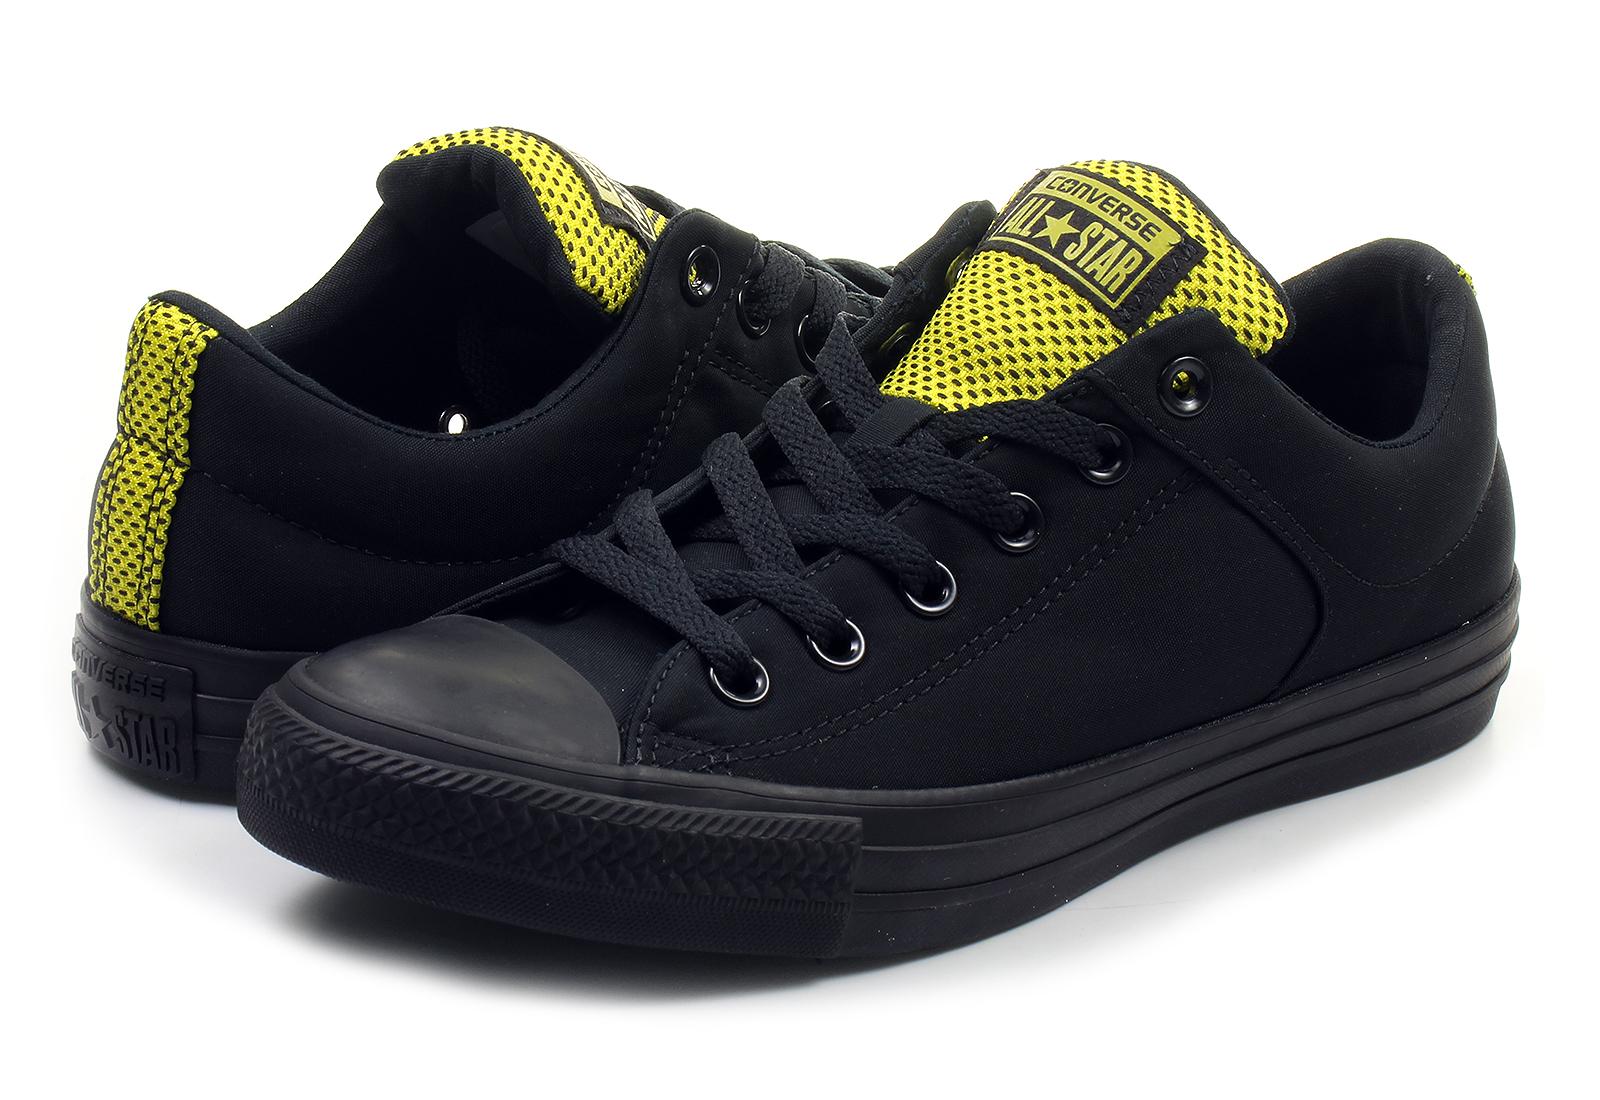 Converse Tornacipő - Chuck Taylor All Star High Street Ox - 155476C ... bae8741f04